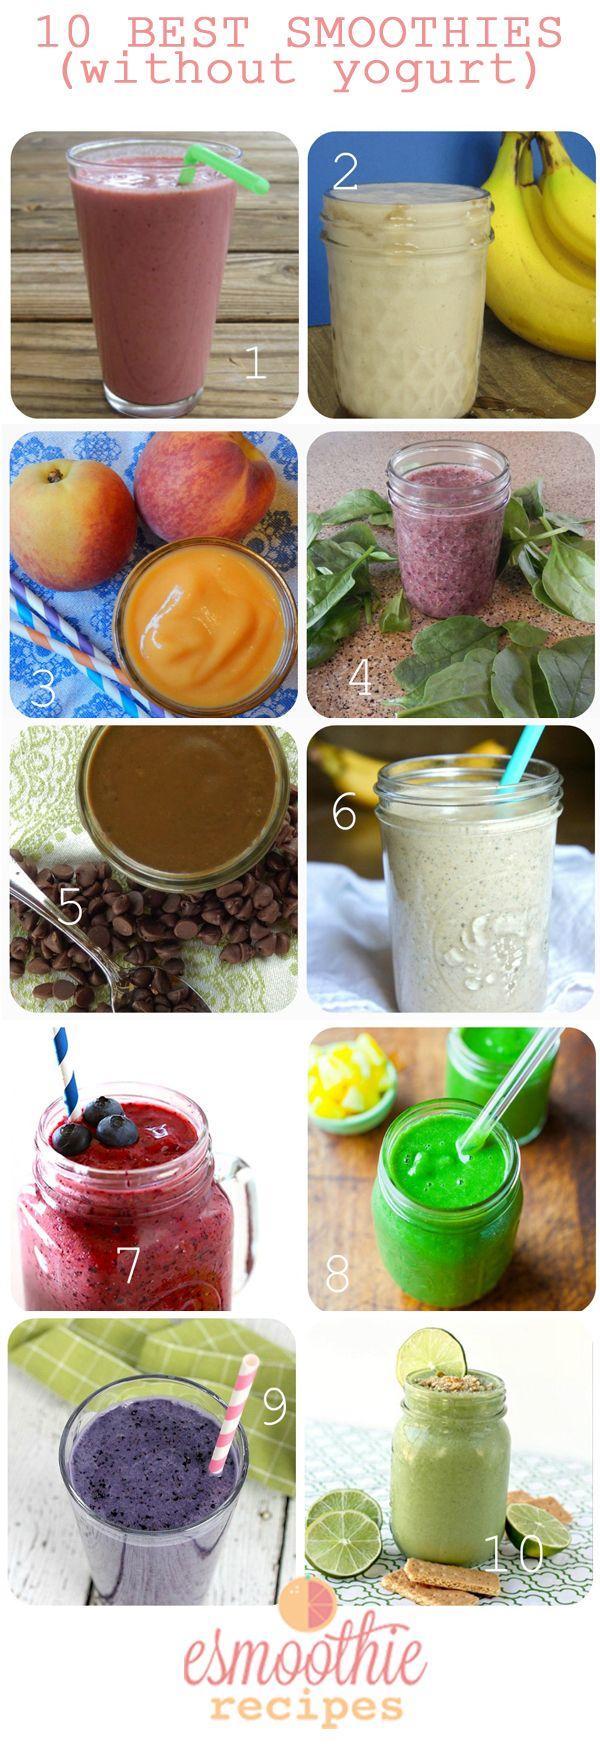 7 Ways to Make Smoothies without Yogurt   Recipes   http://www.esmoothierecipesforkids.com/7-ways-make-smoothies-without-yogurt-recipes/